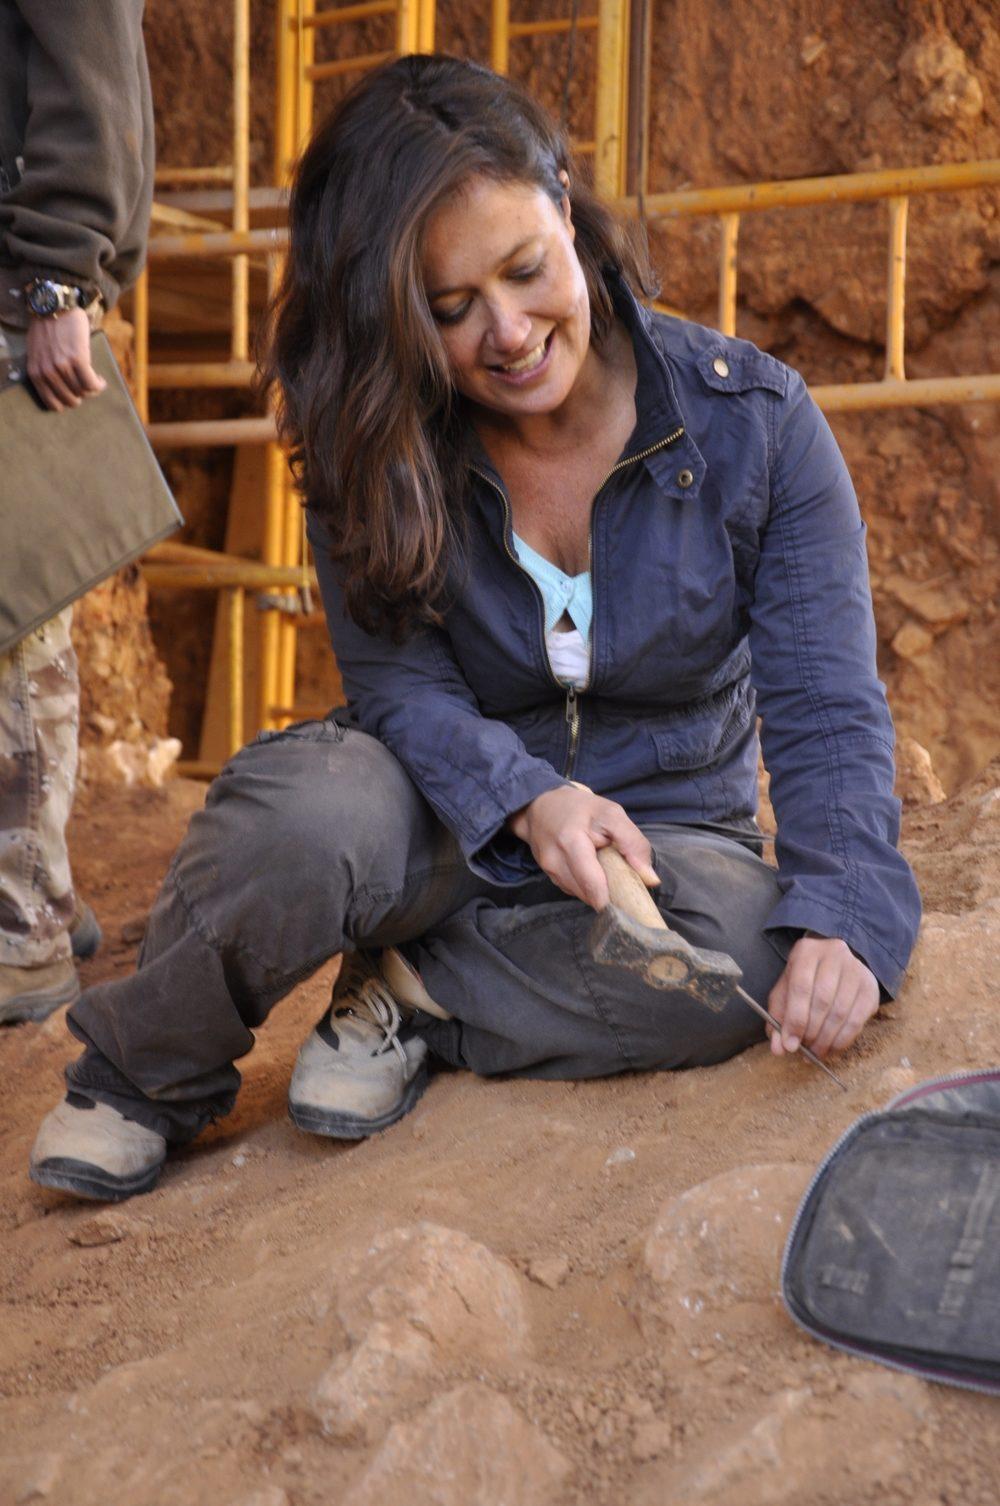 MaríaMartinon-Torres at the Atapuerca sites. Photo credit: A. Canet.